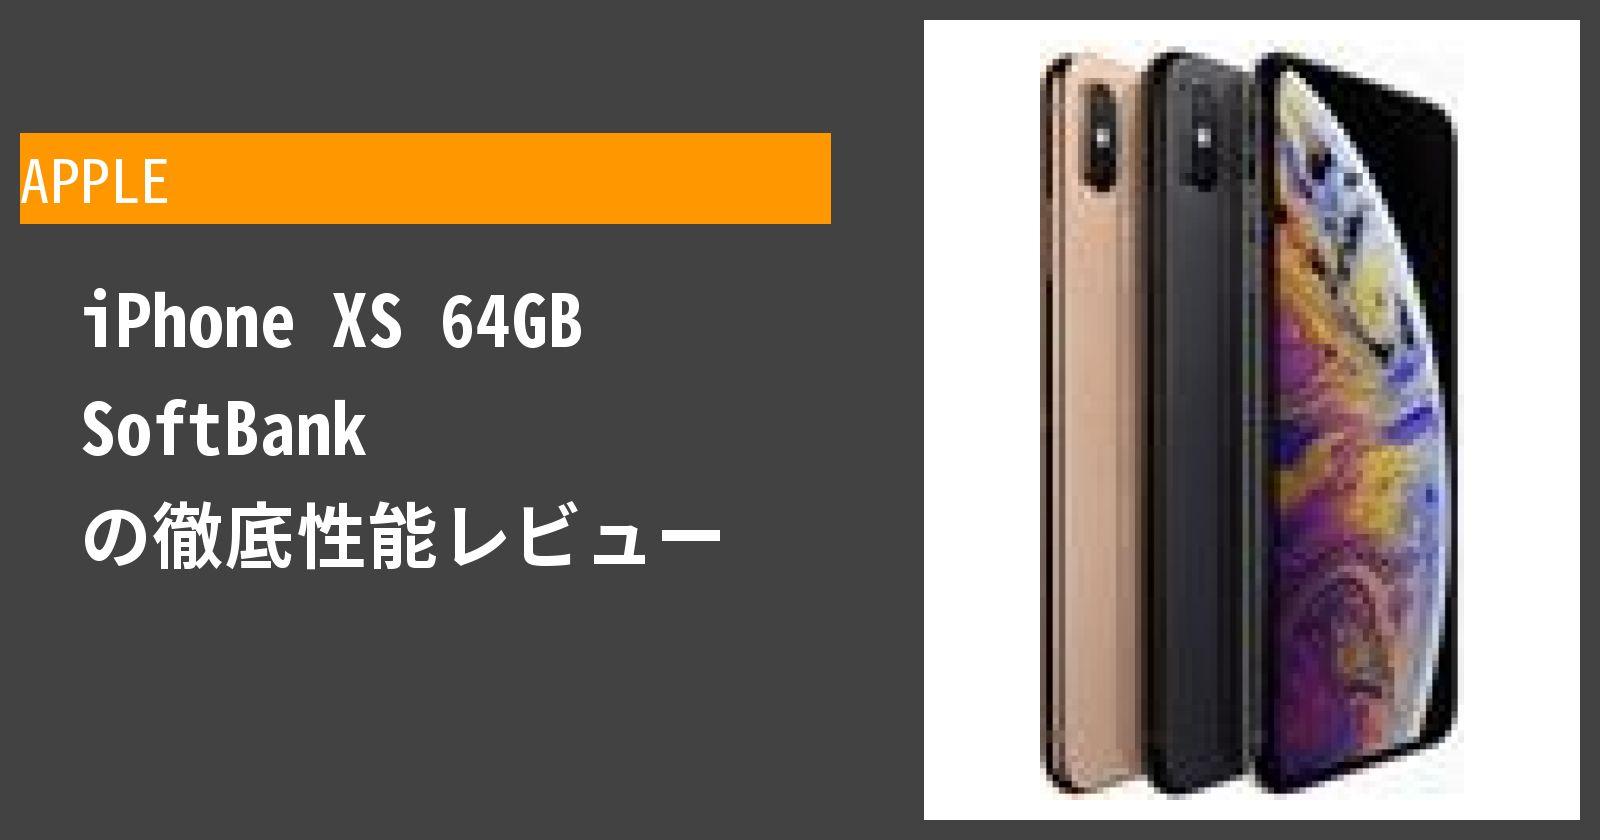 iPhone XS 64GB SoftBank の徹底性能レビュー